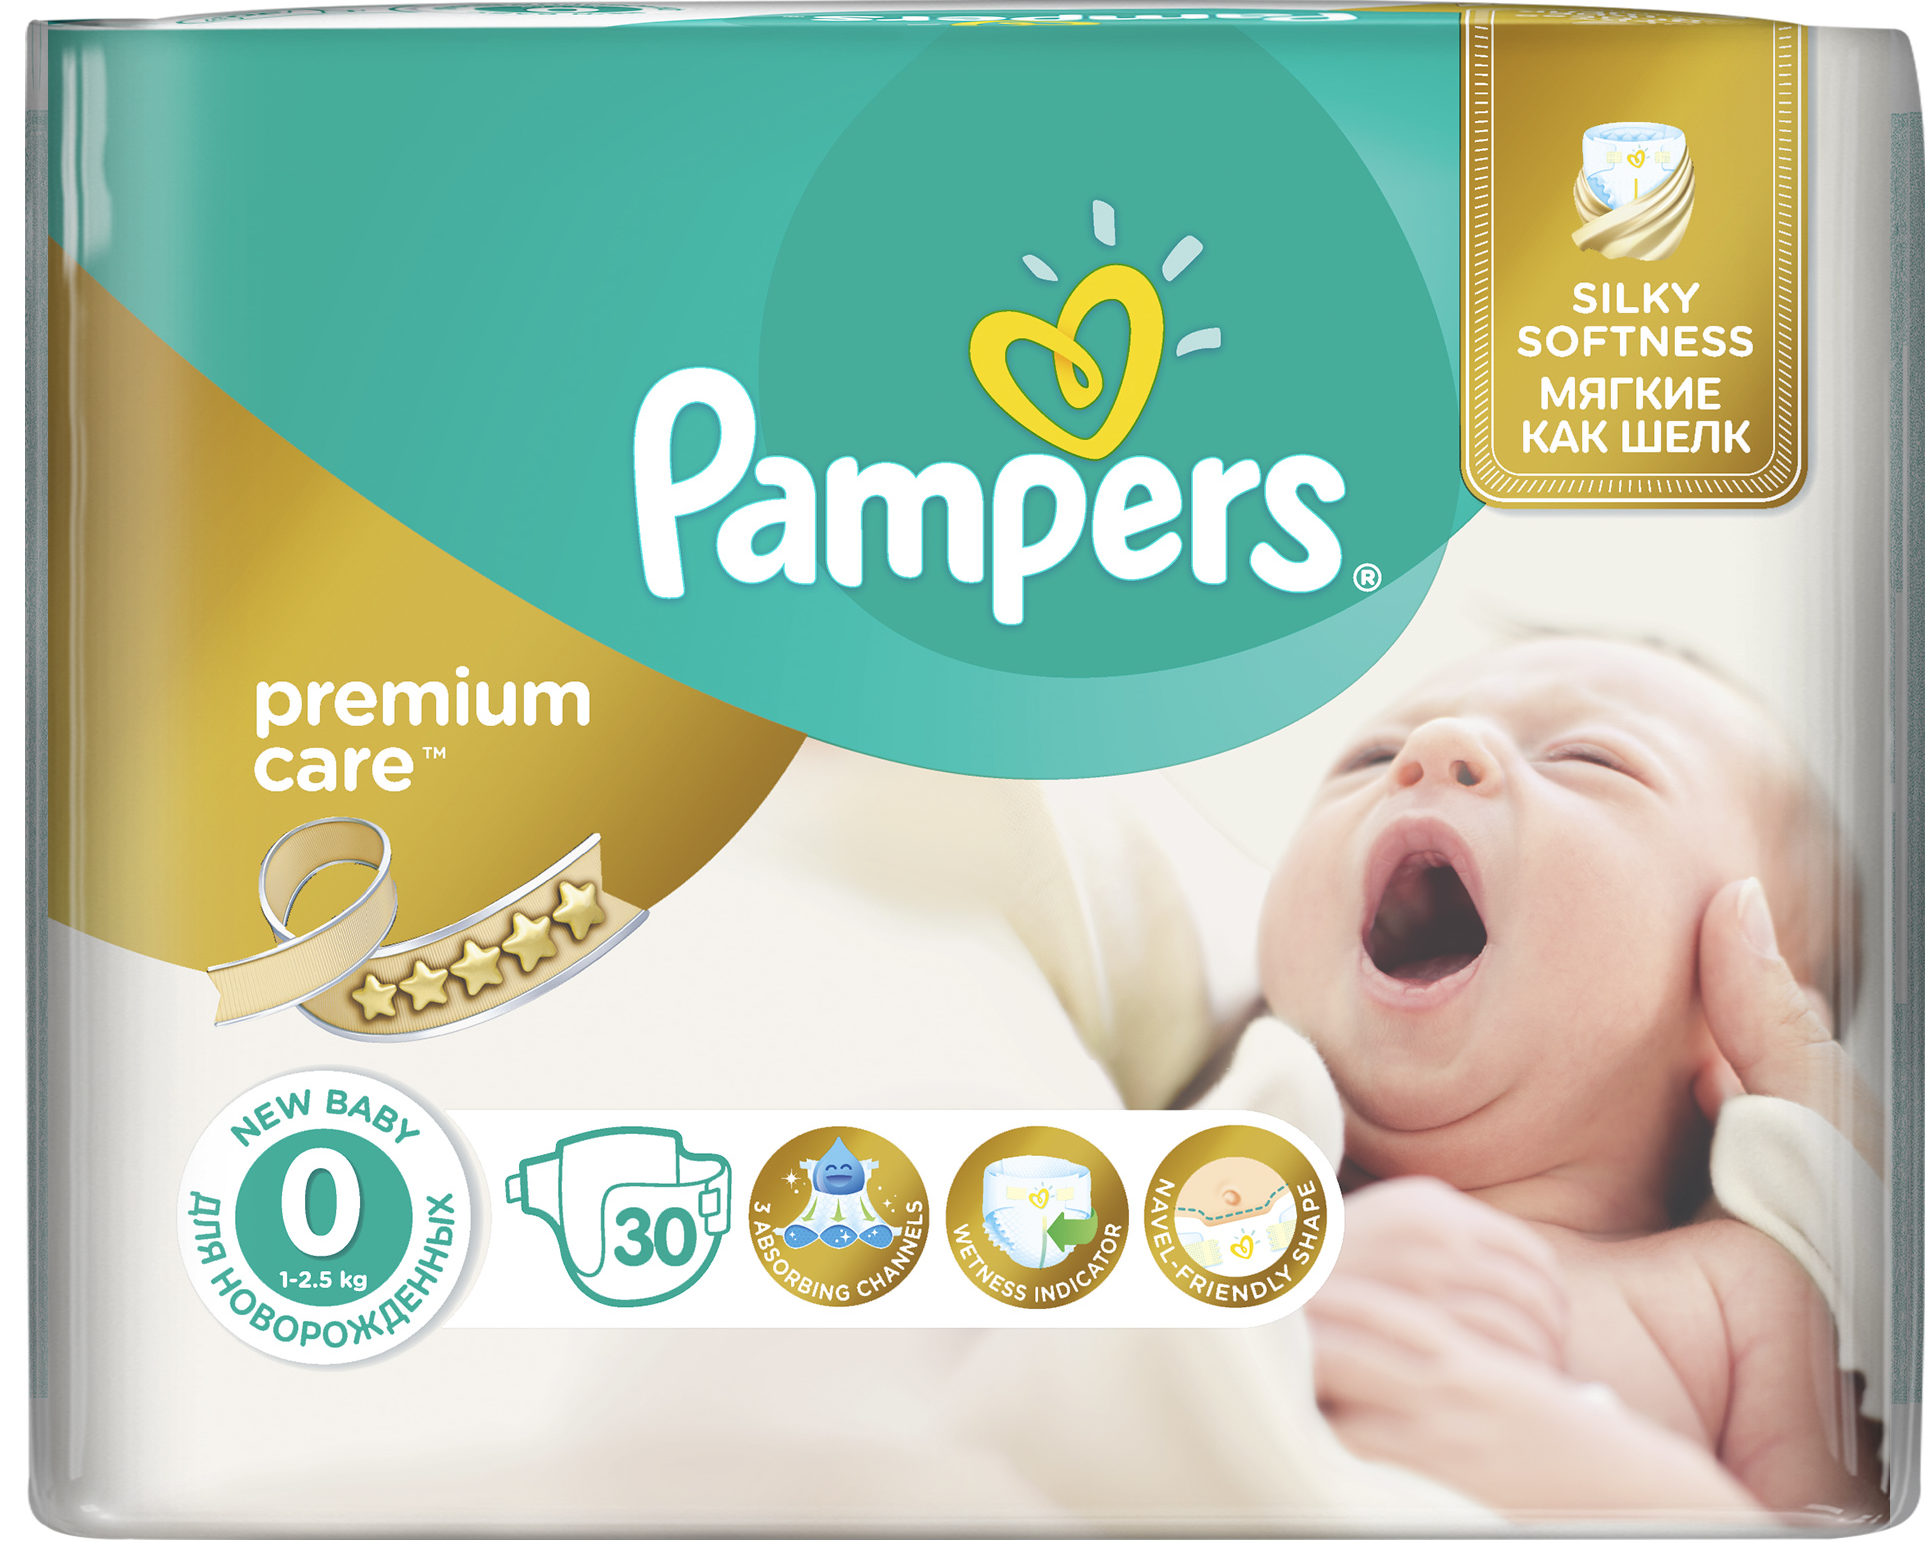 pampers-premium-care-0-1-25-kg